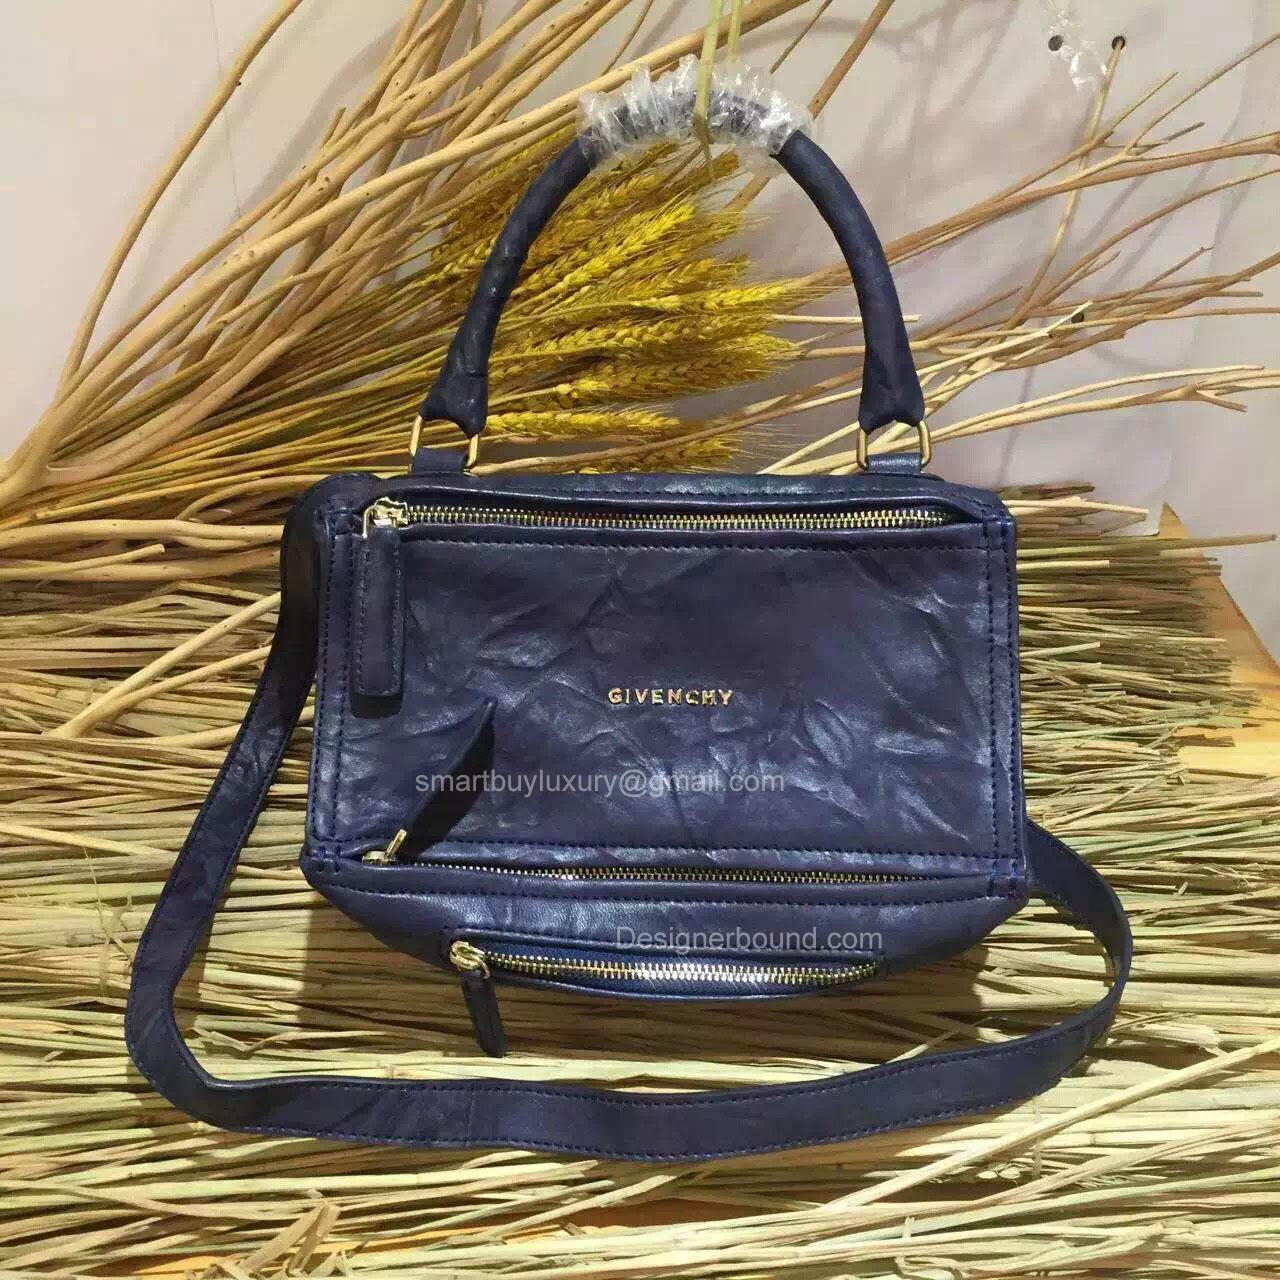 6910b698a291 Givenchy Pepe Pandora Mini Messenger Bag Blue 2851721 -